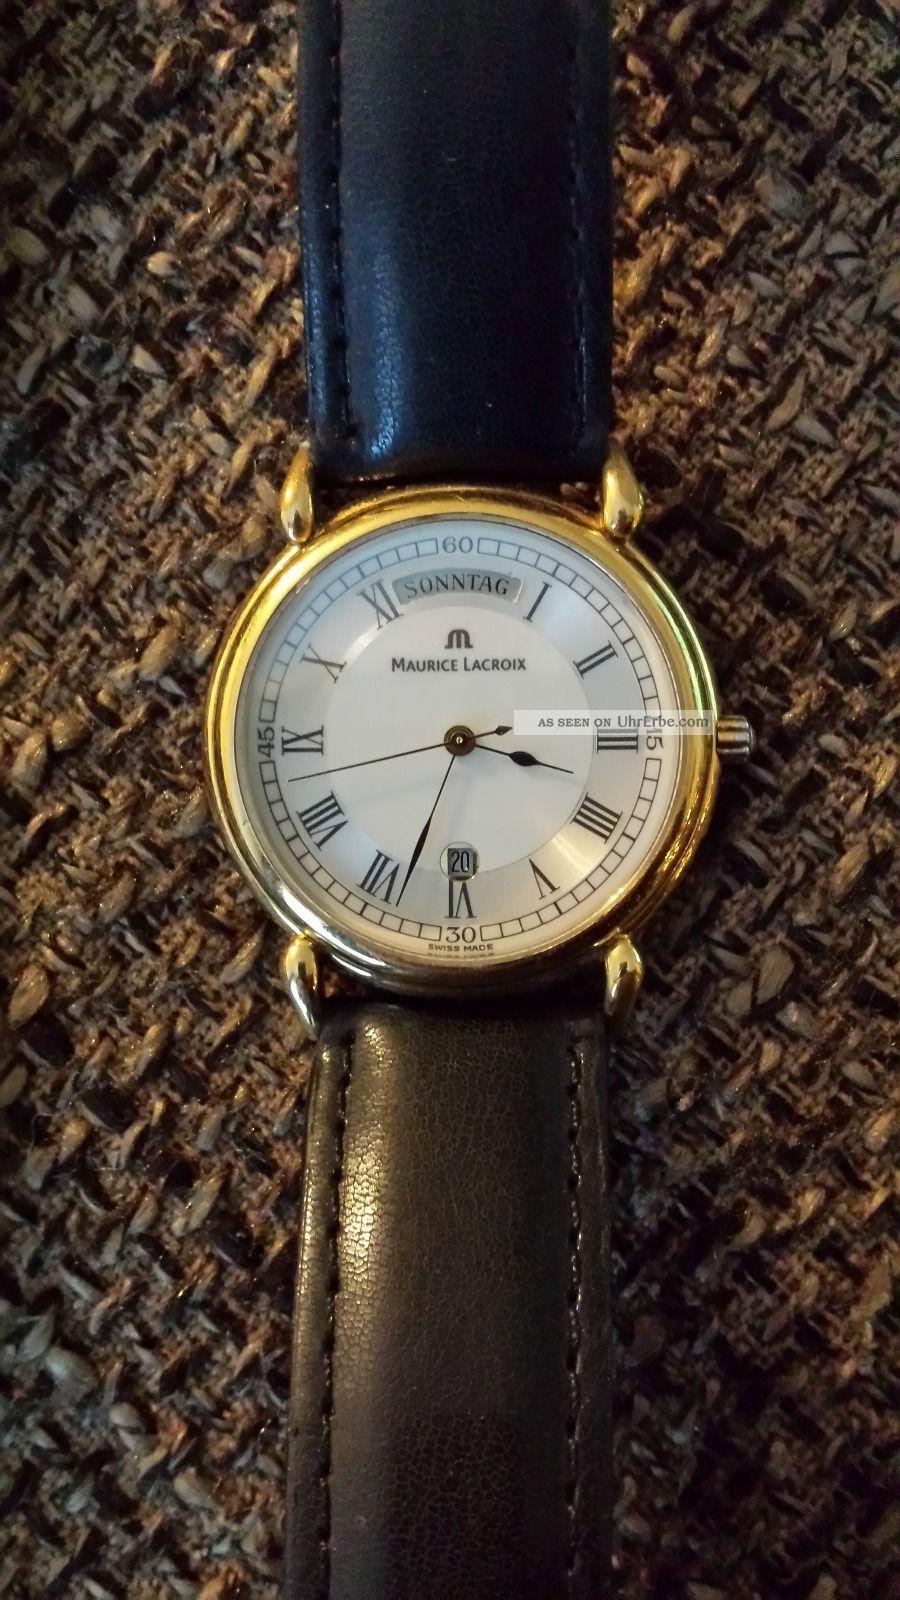 Maurice Lacroix Swiss Made Sapphire Crystal Herre Damen Leder Armbanduhr Armbanduhren Bild